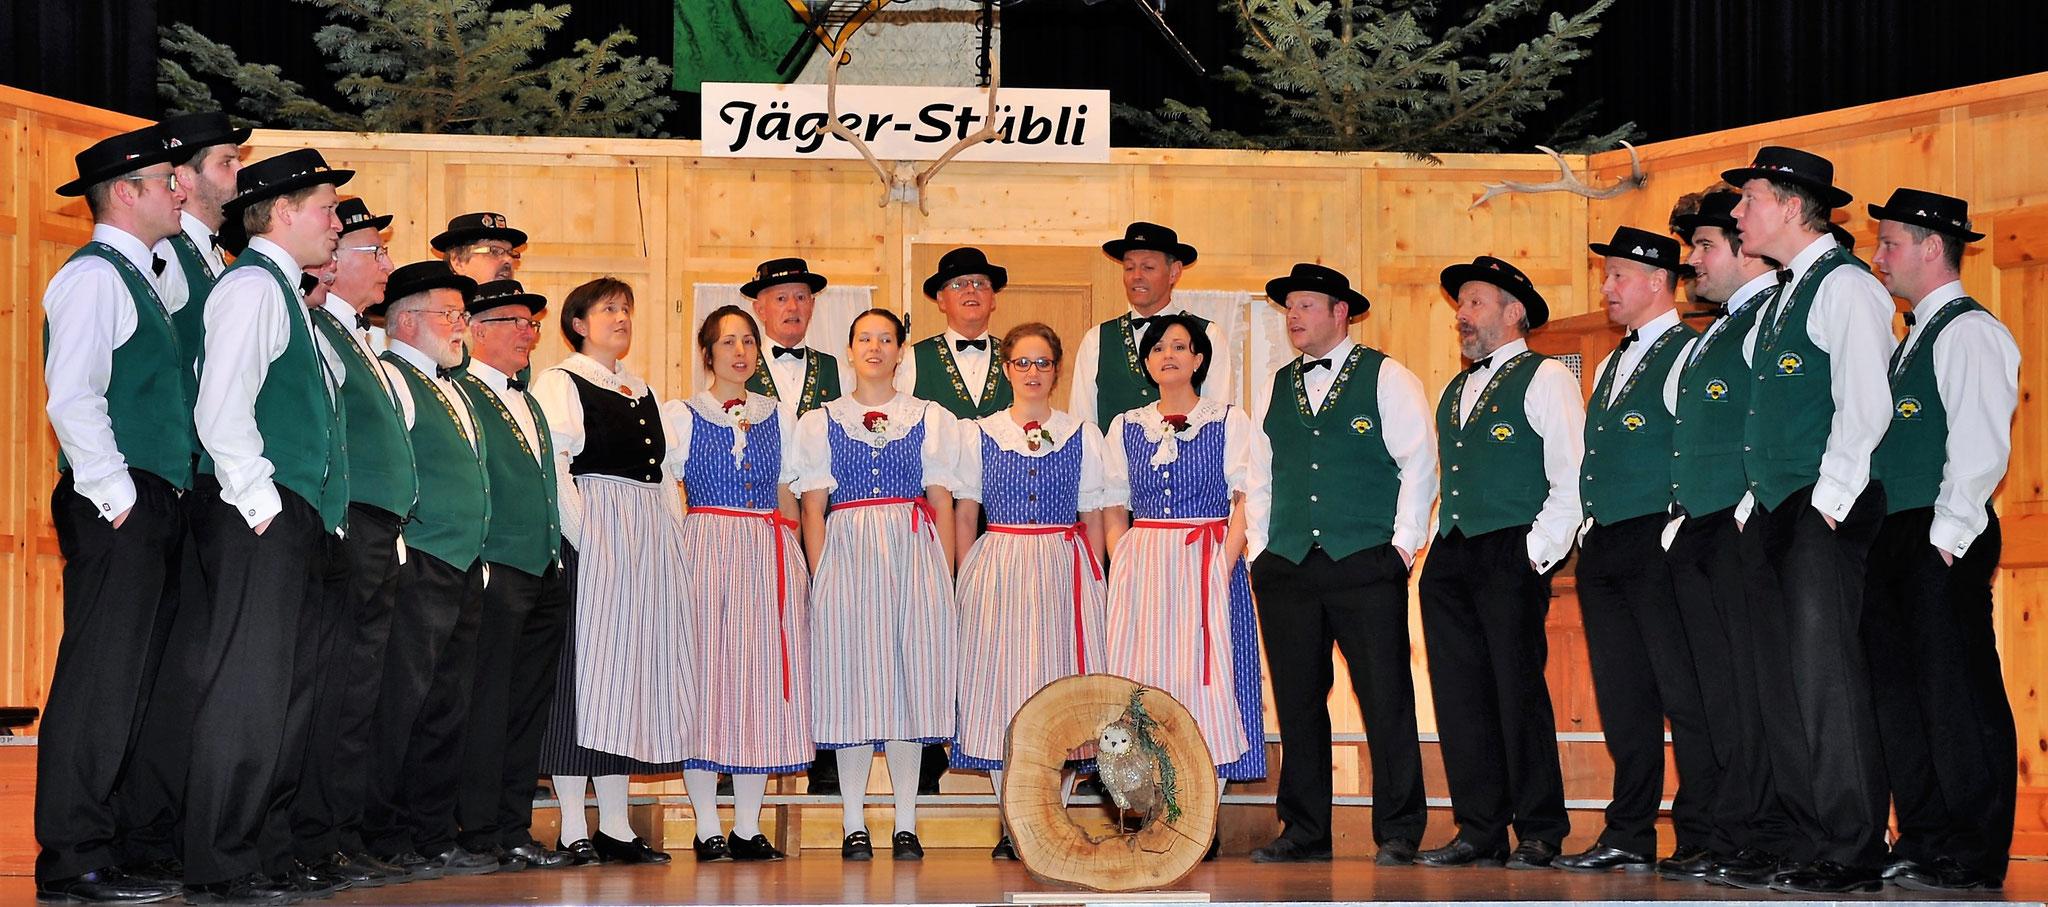 Jodelklub Altstätten